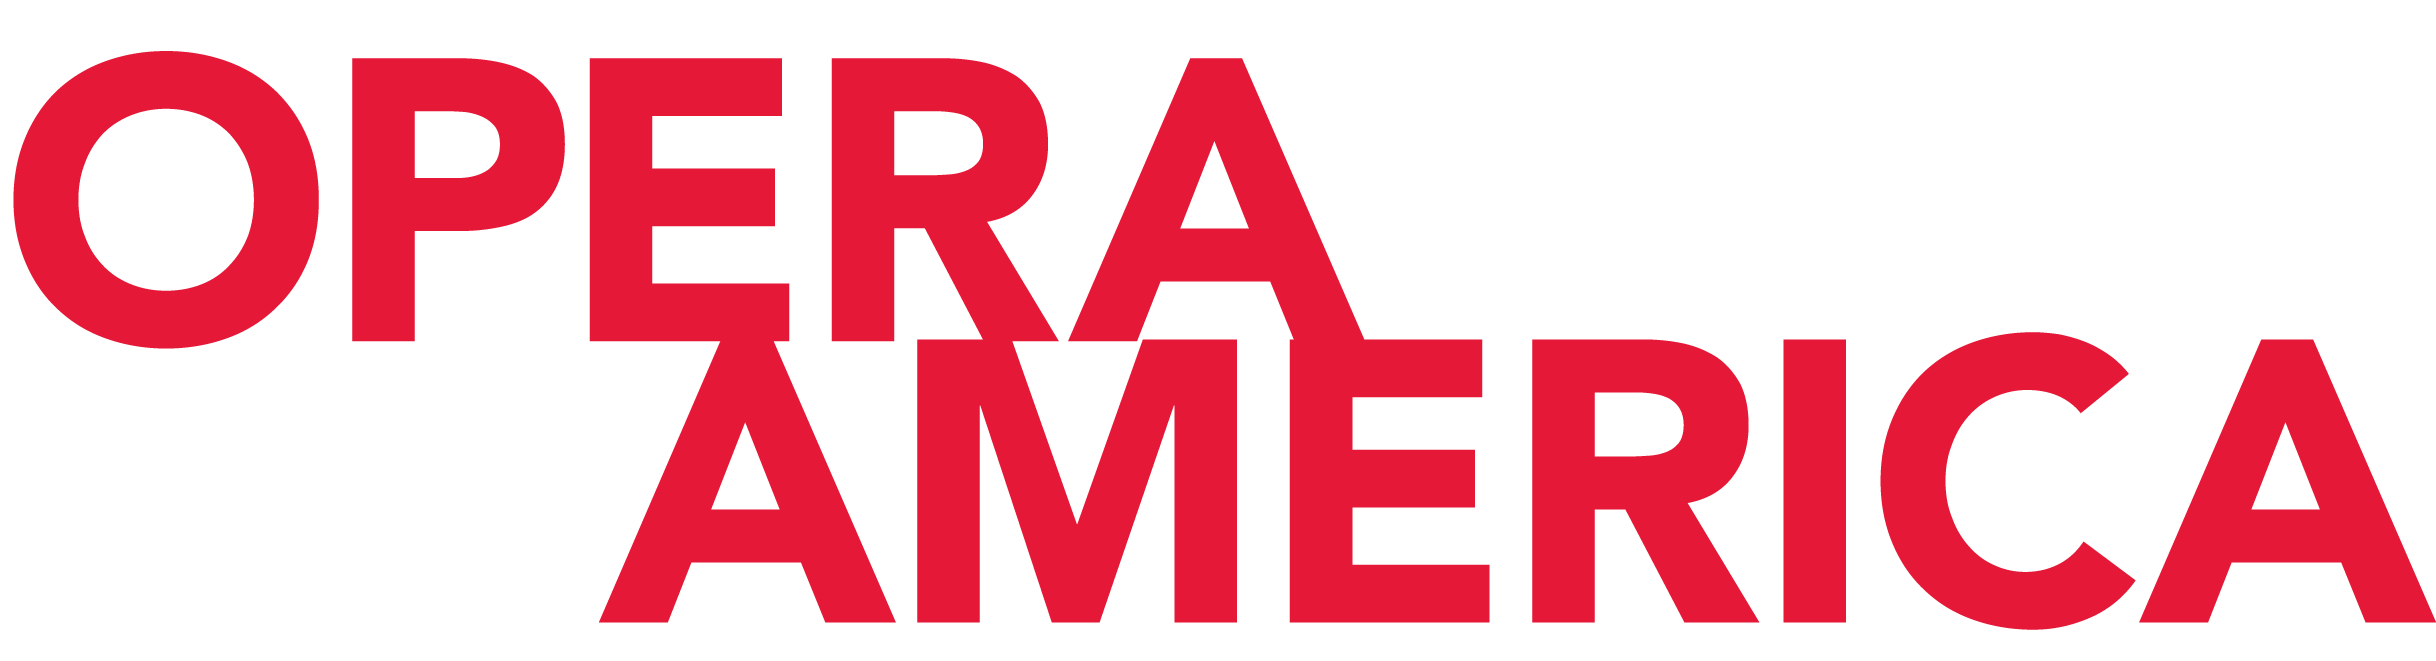 opera-america-logo